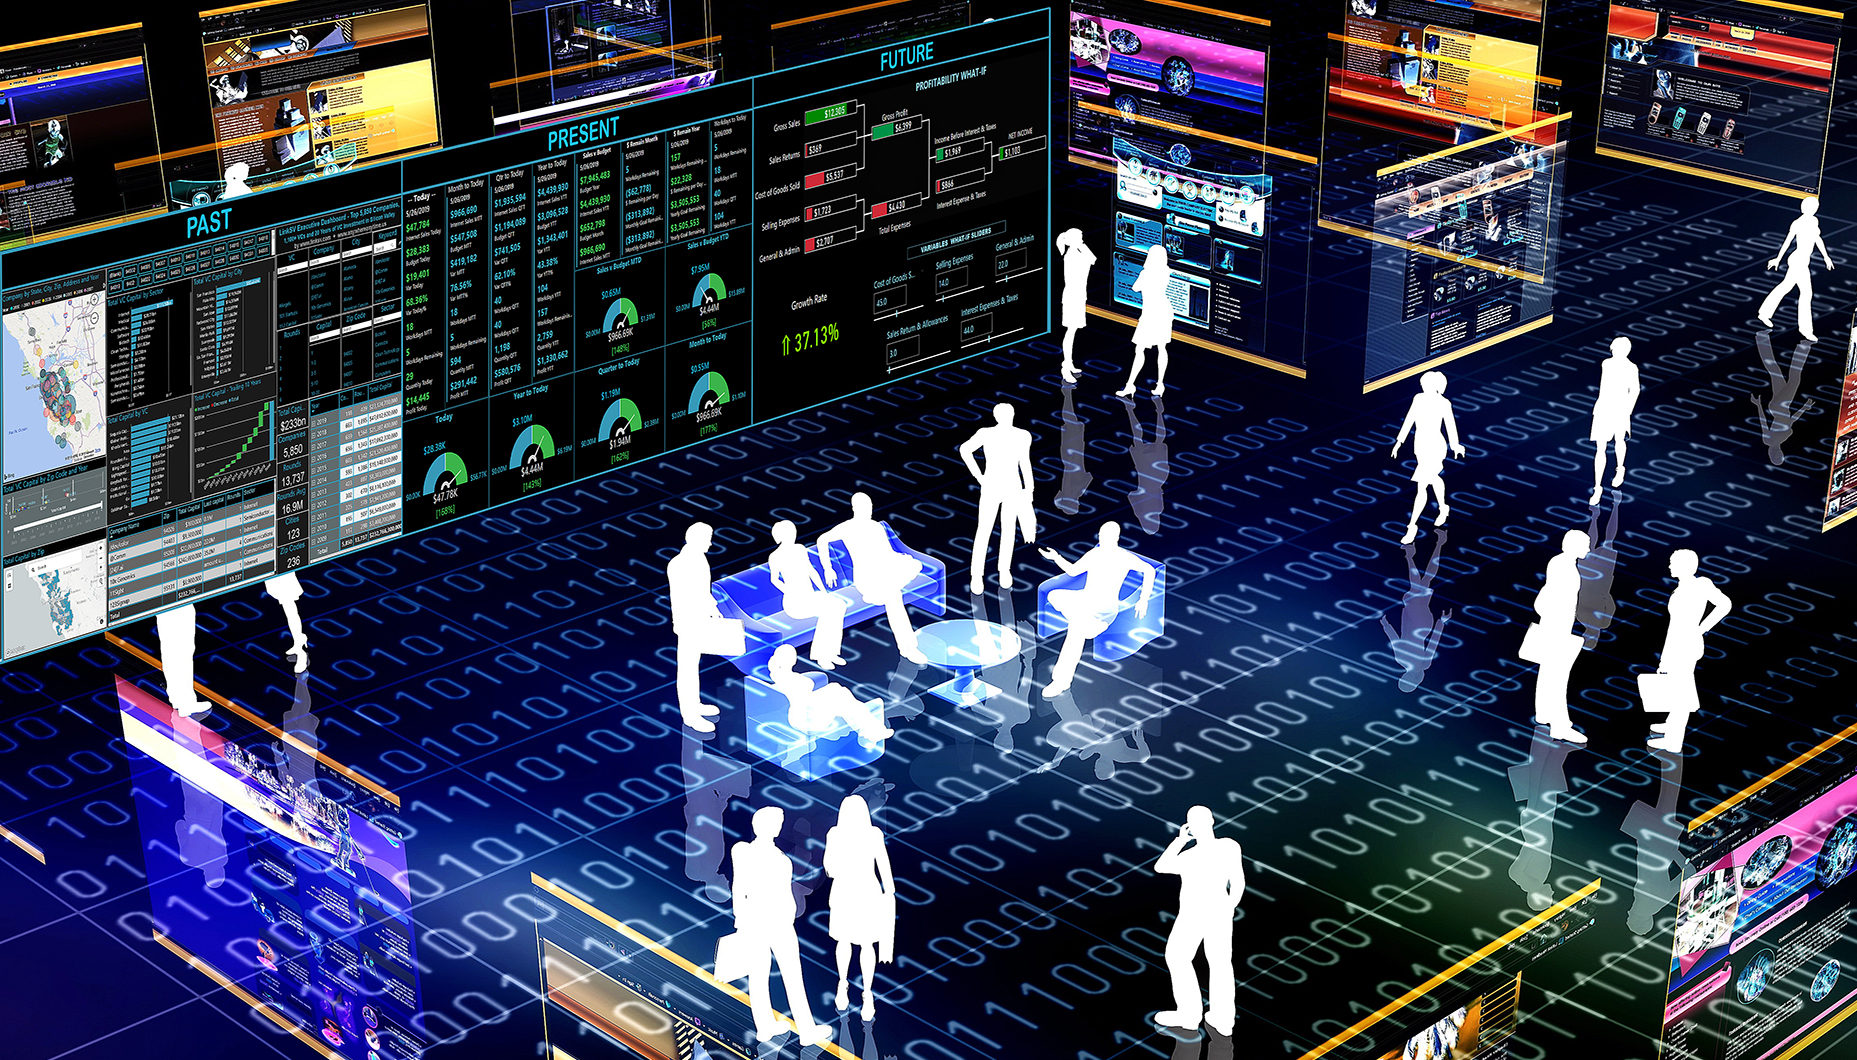 Virtual Executive CONTROL ROOM JPEG FINAL 6-3-2019 - ADDED PROFITABILITY UM 80 .6 - 1920 x 1080